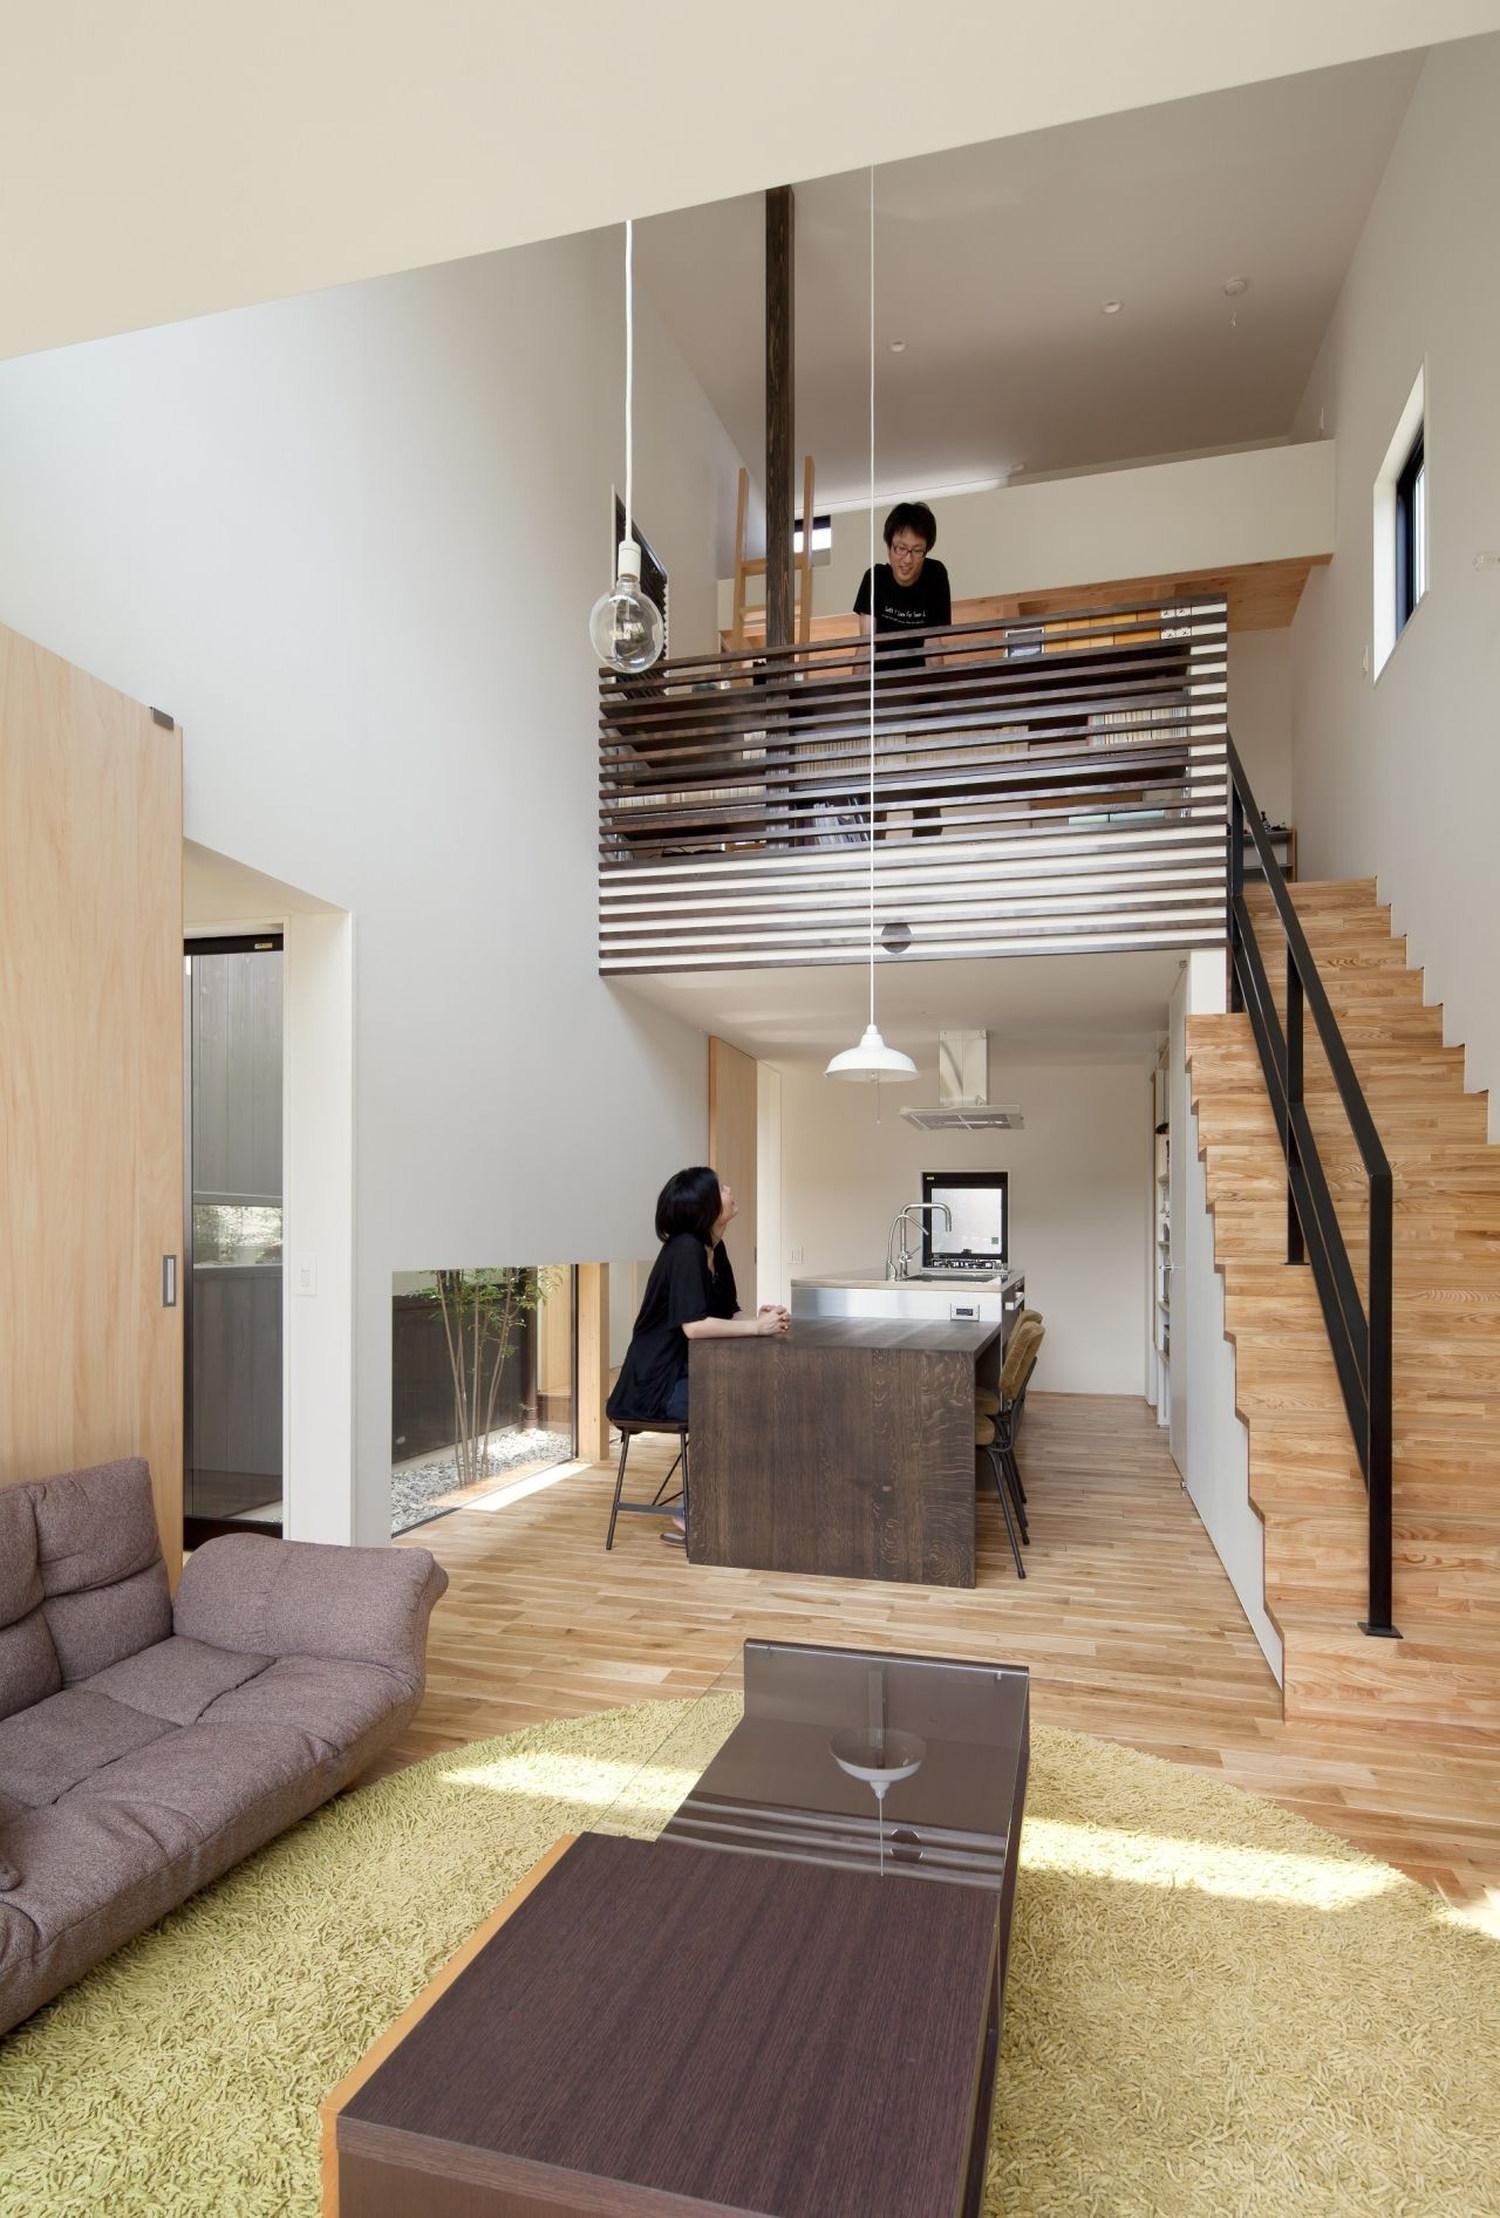 Niu house by yoshihiro yamamoto architect atlier karmatrendz for Arredamento moderno casa piccola